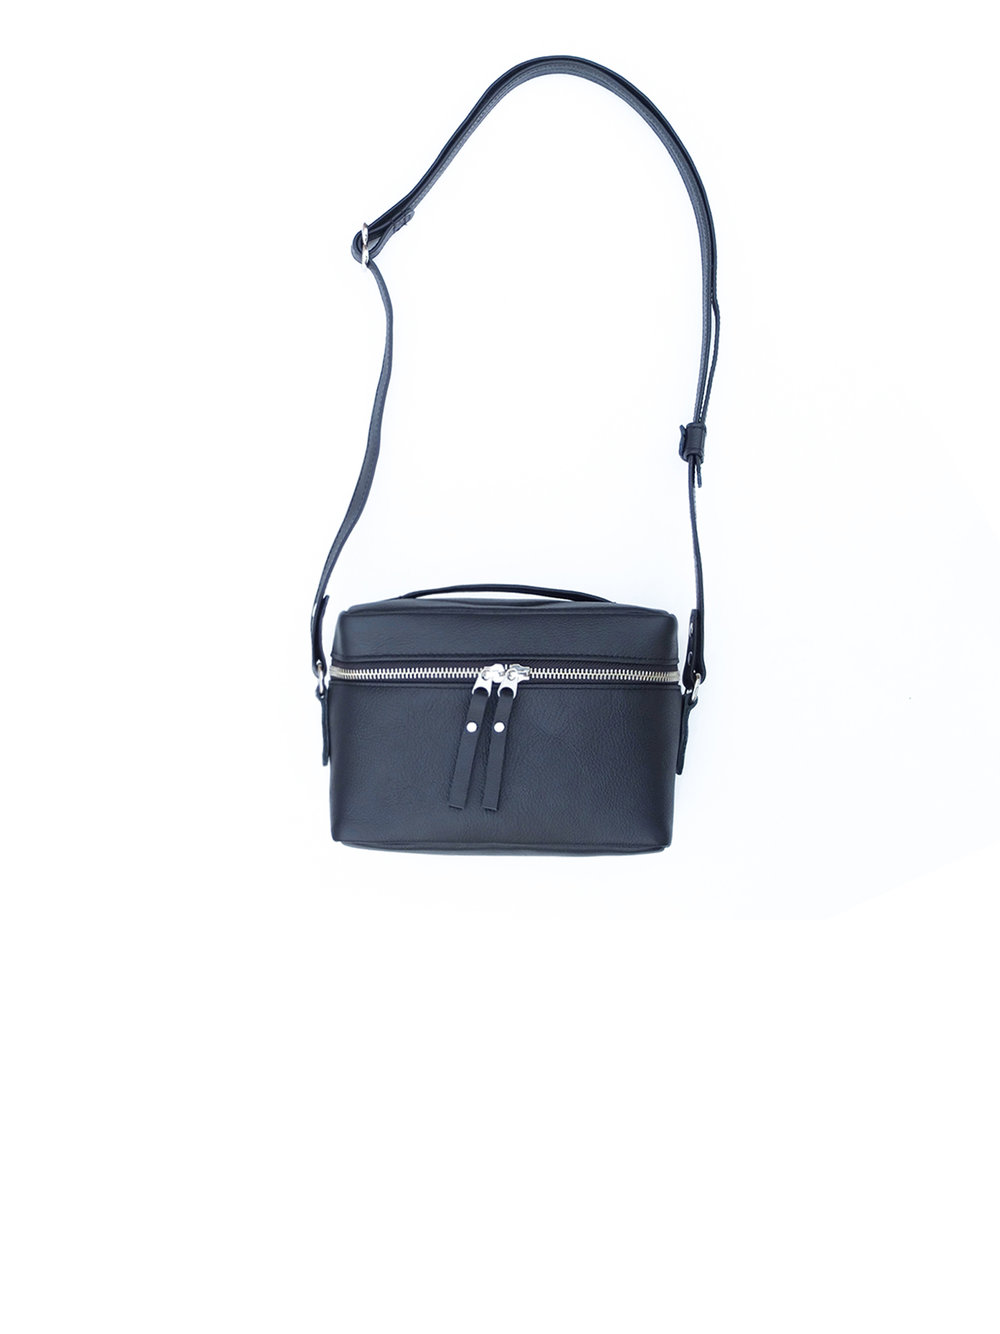 Box handbag - 140.00$